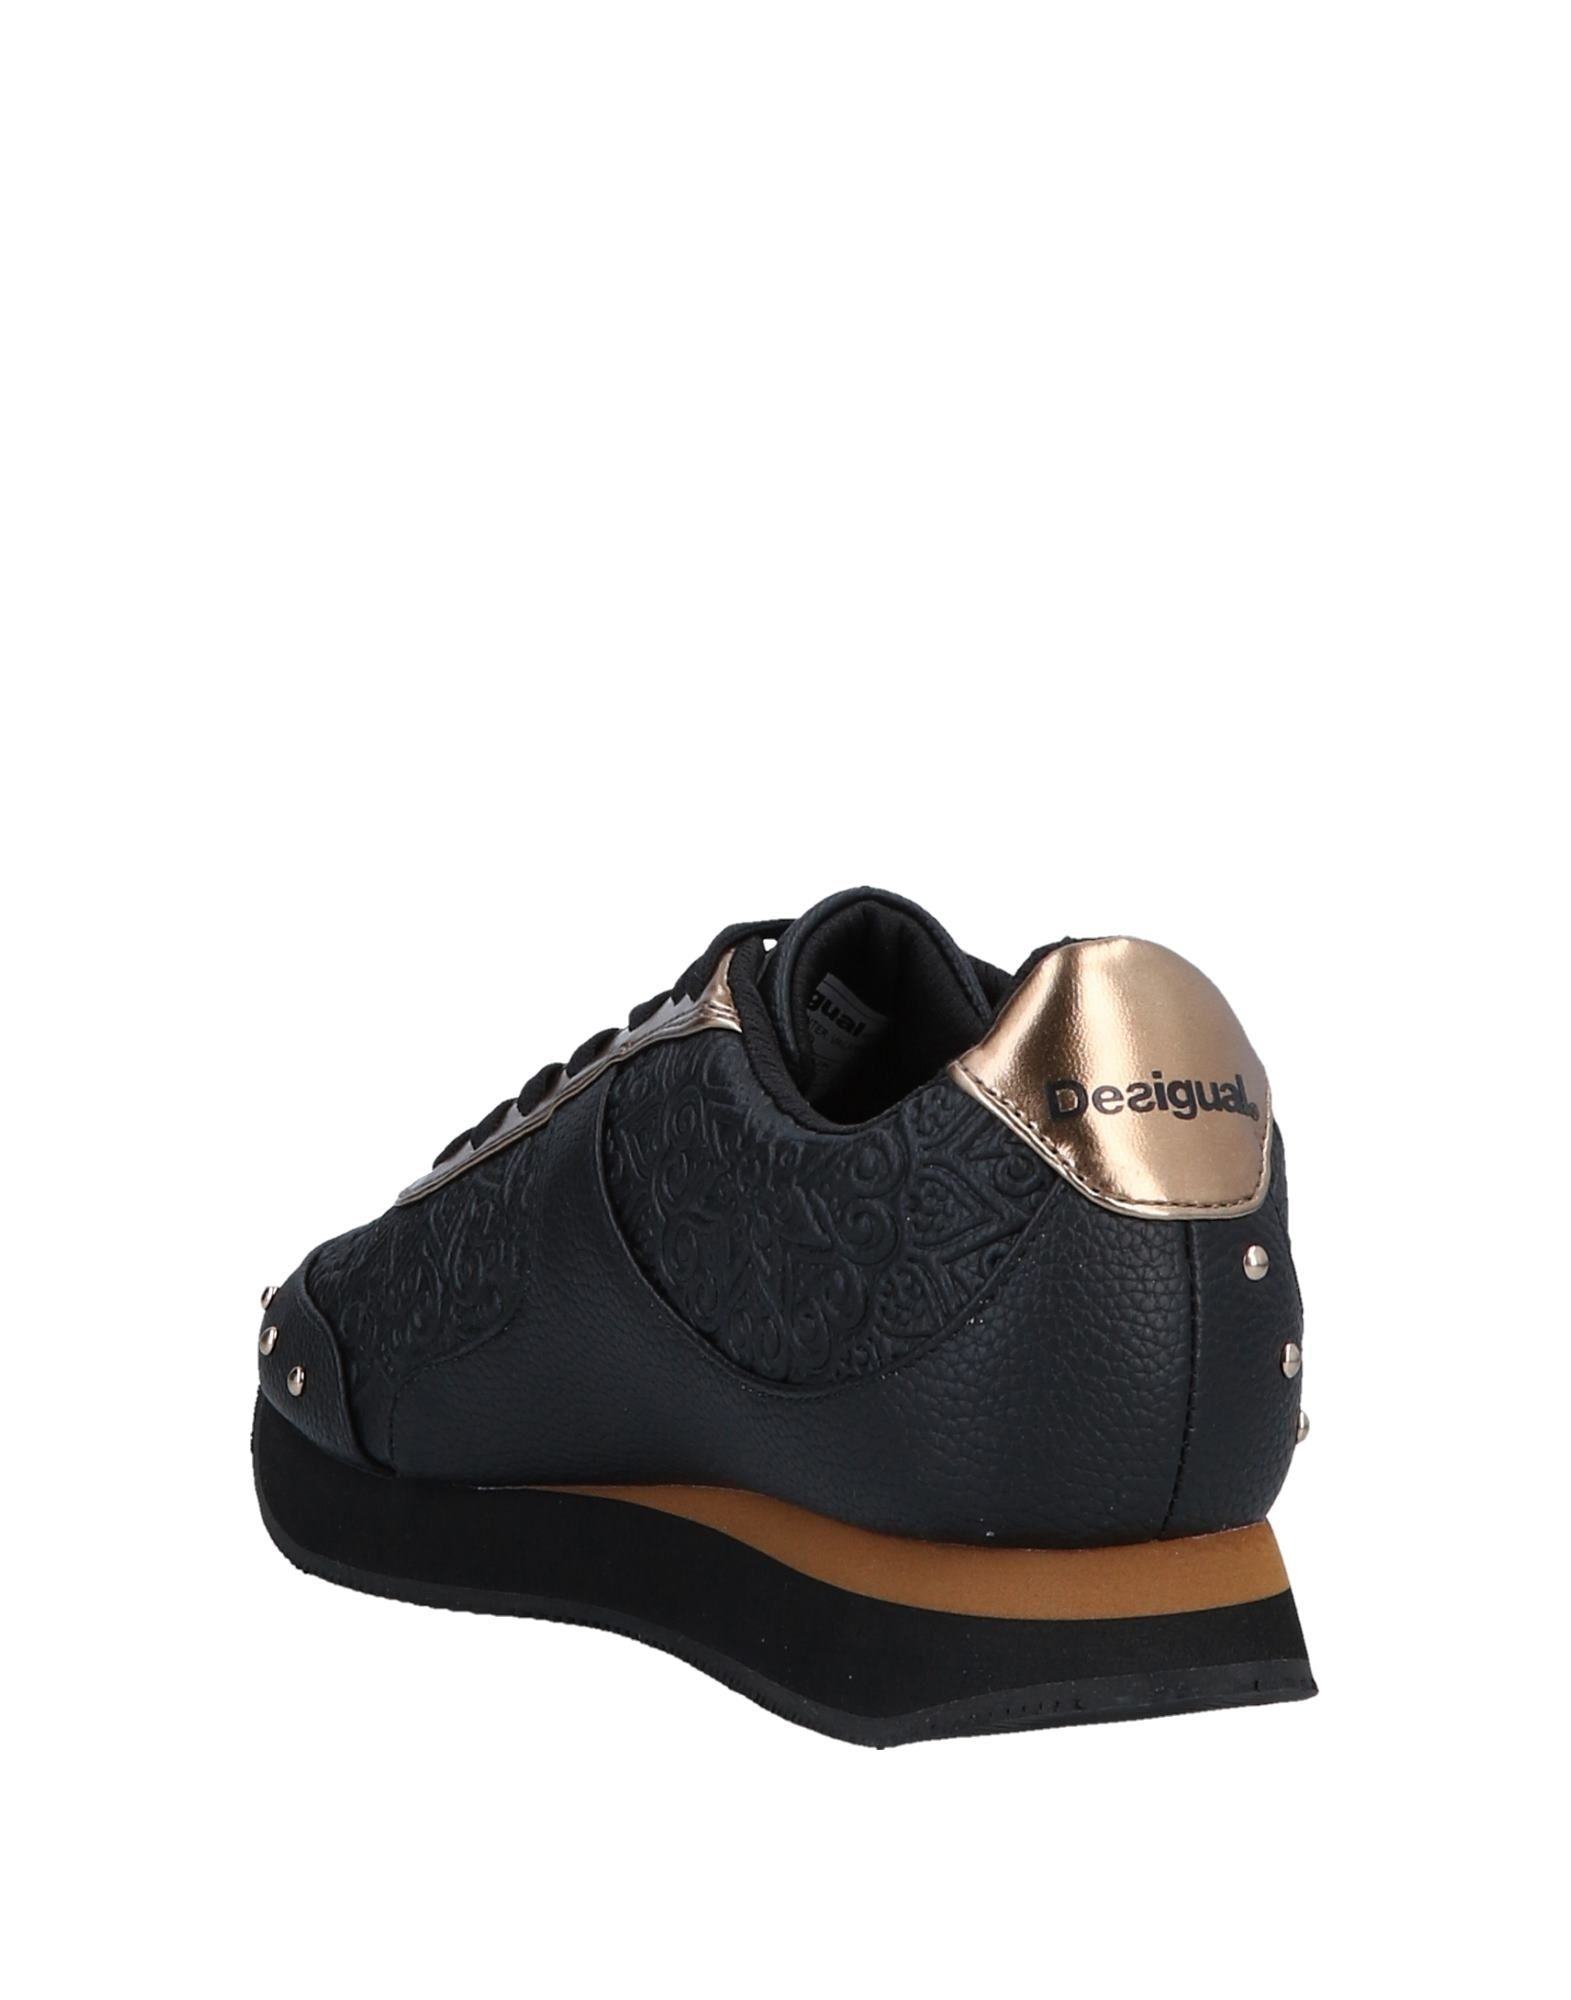 Desigual Gute Sneakers Damen  11574099EP Gute Desigual Qualität beliebte Schuhe f8f763